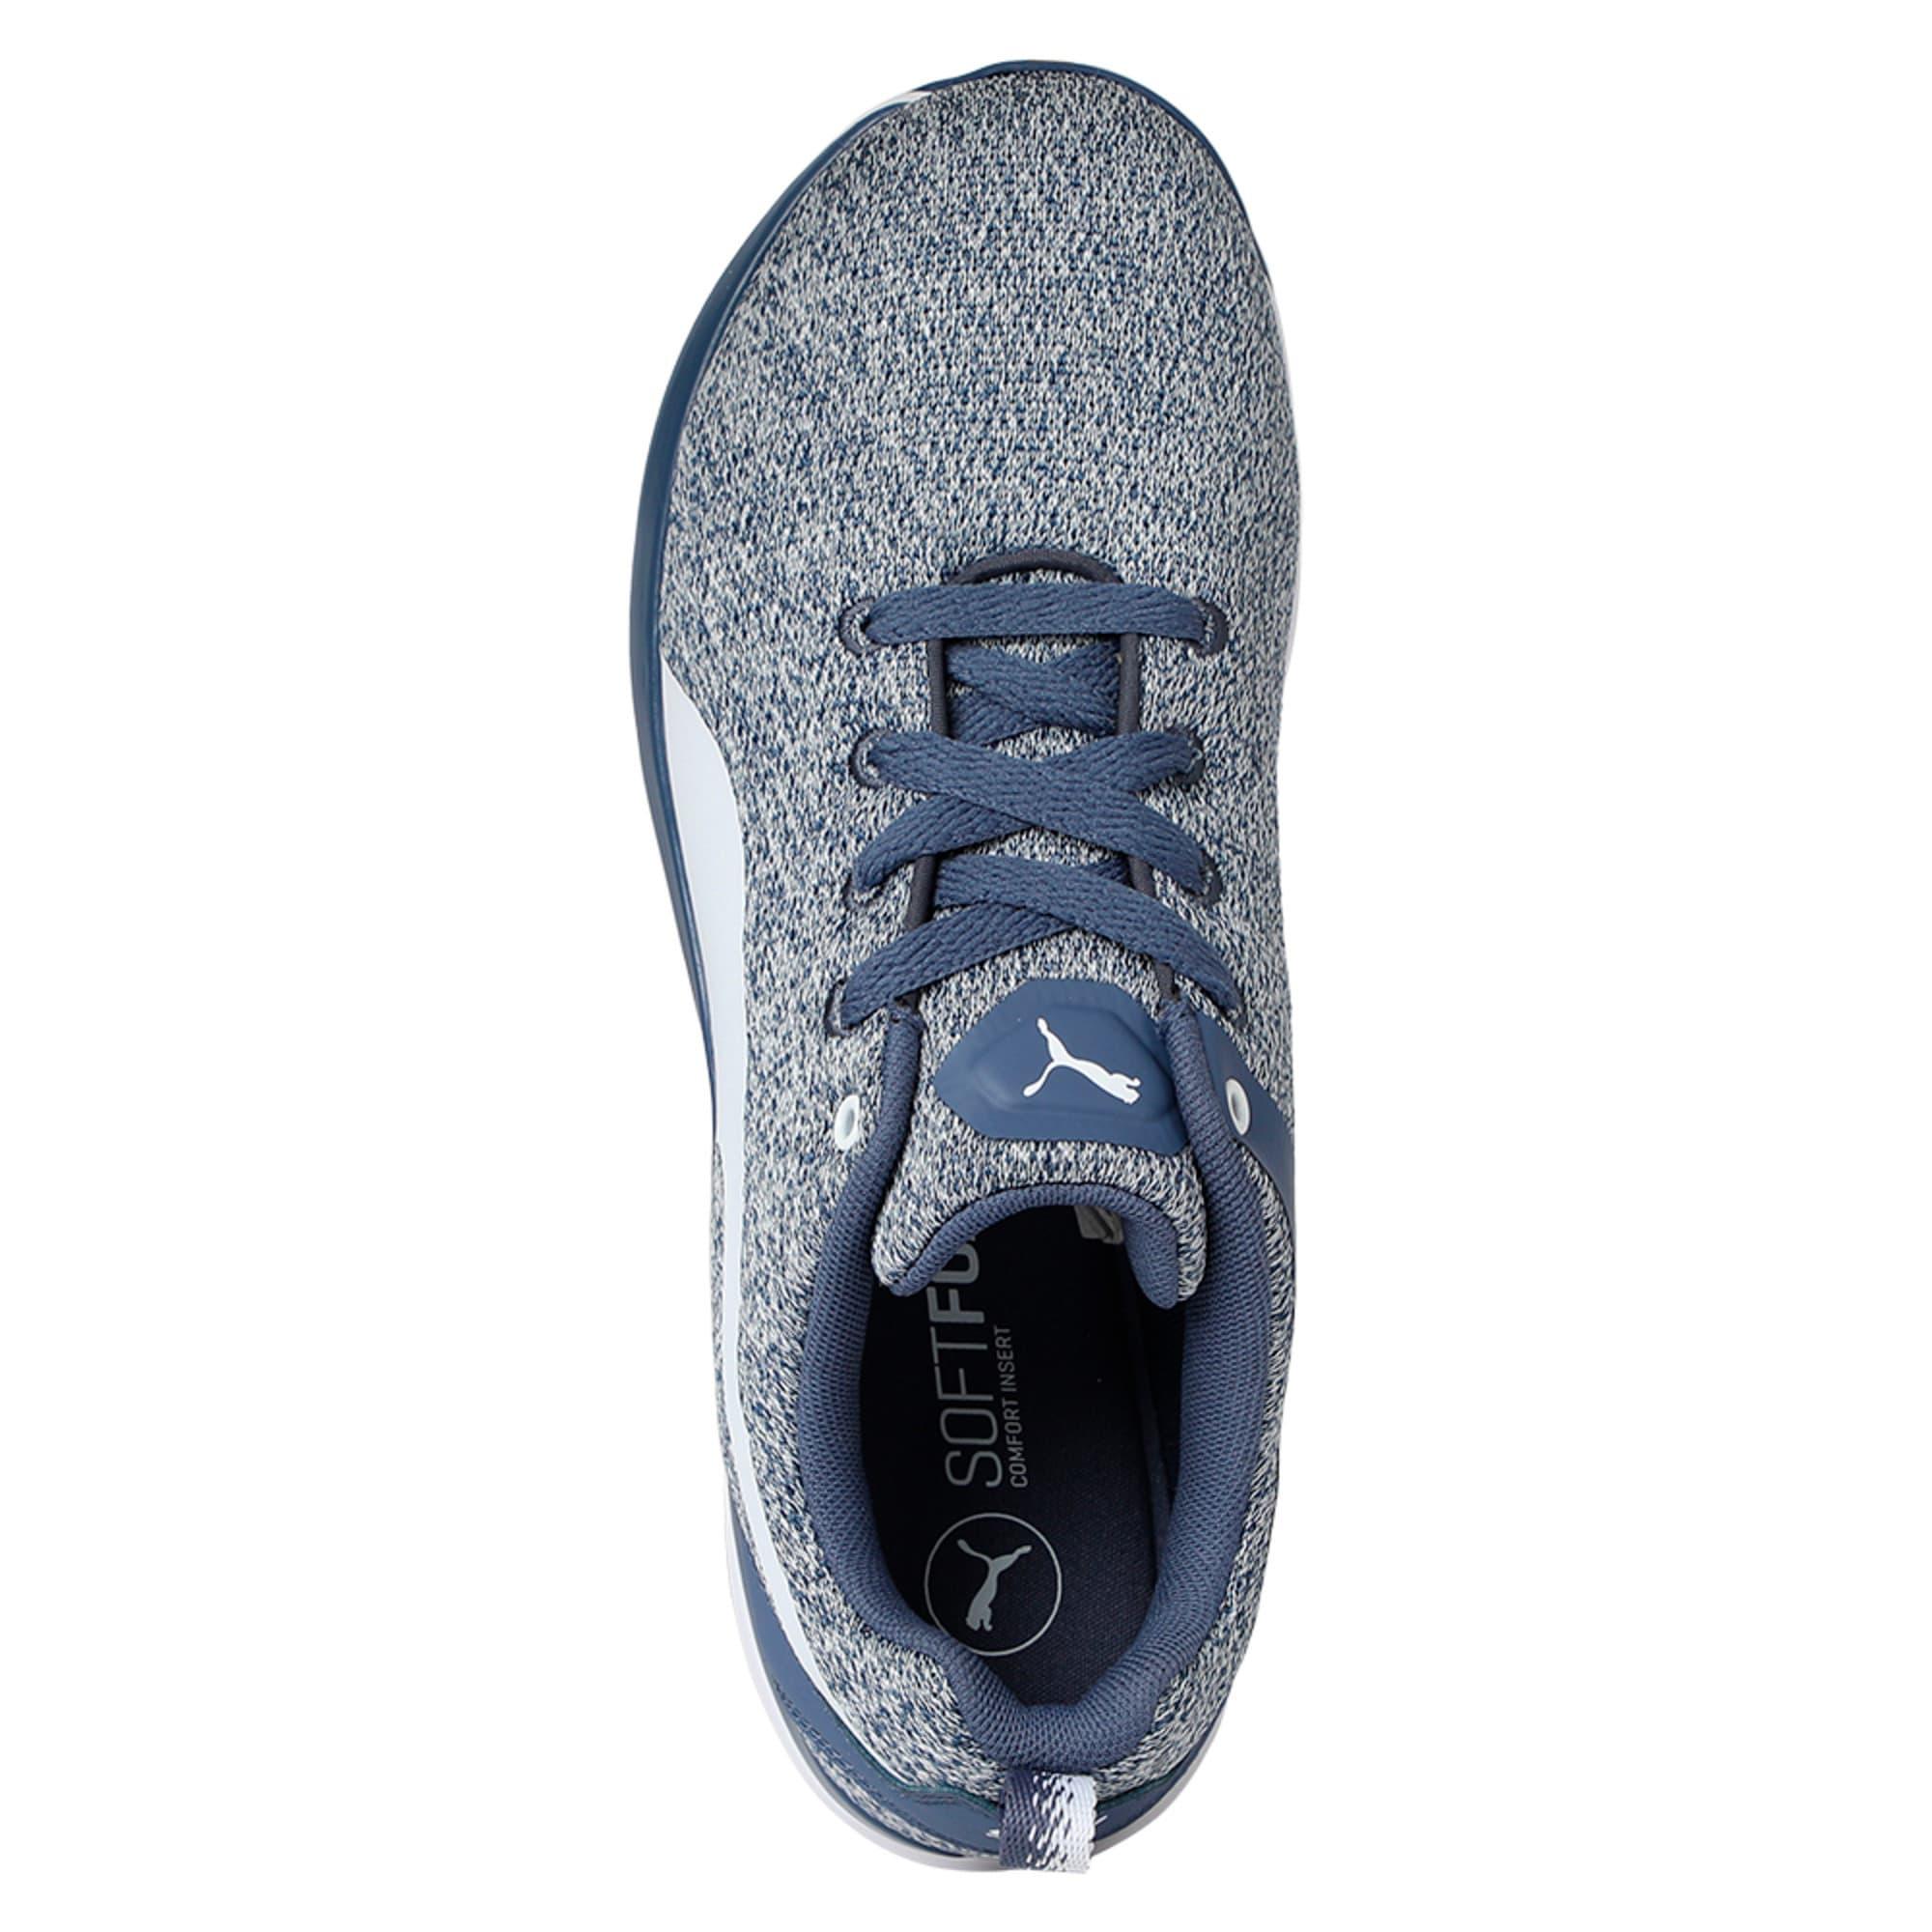 Thumbnail 3 of Flex XT Knit Women's Training Shoes, Blue Indigo-Puma White, medium-IND